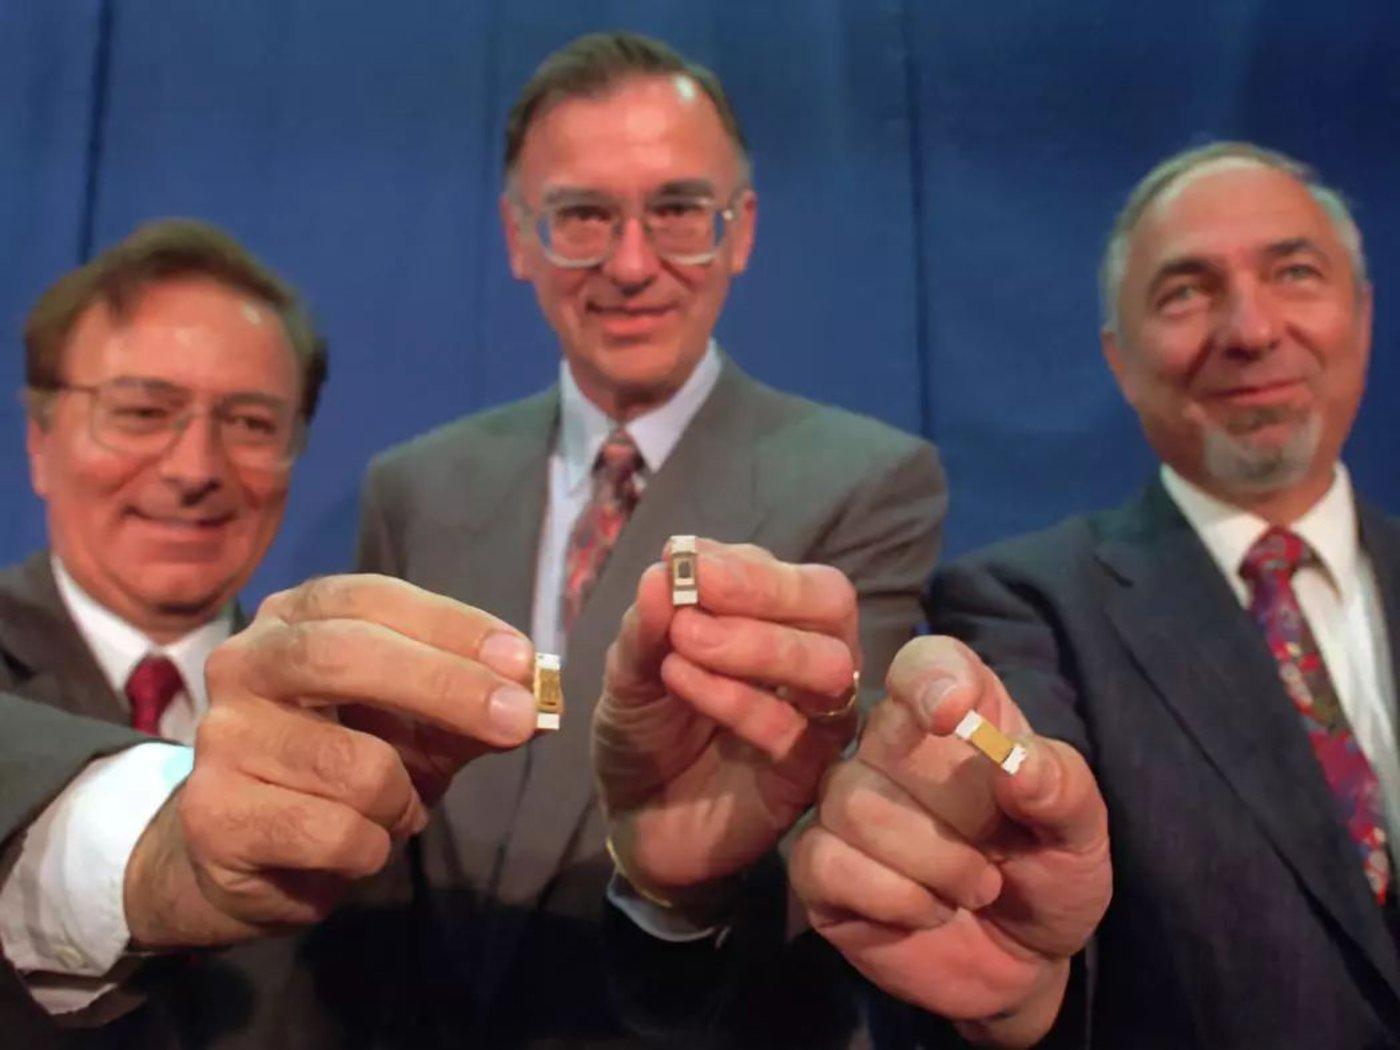 Federico Faggin,Ted Hoff和Stanley Mazor手持英特尔4004处理器在国家发明家名人堂,1996年